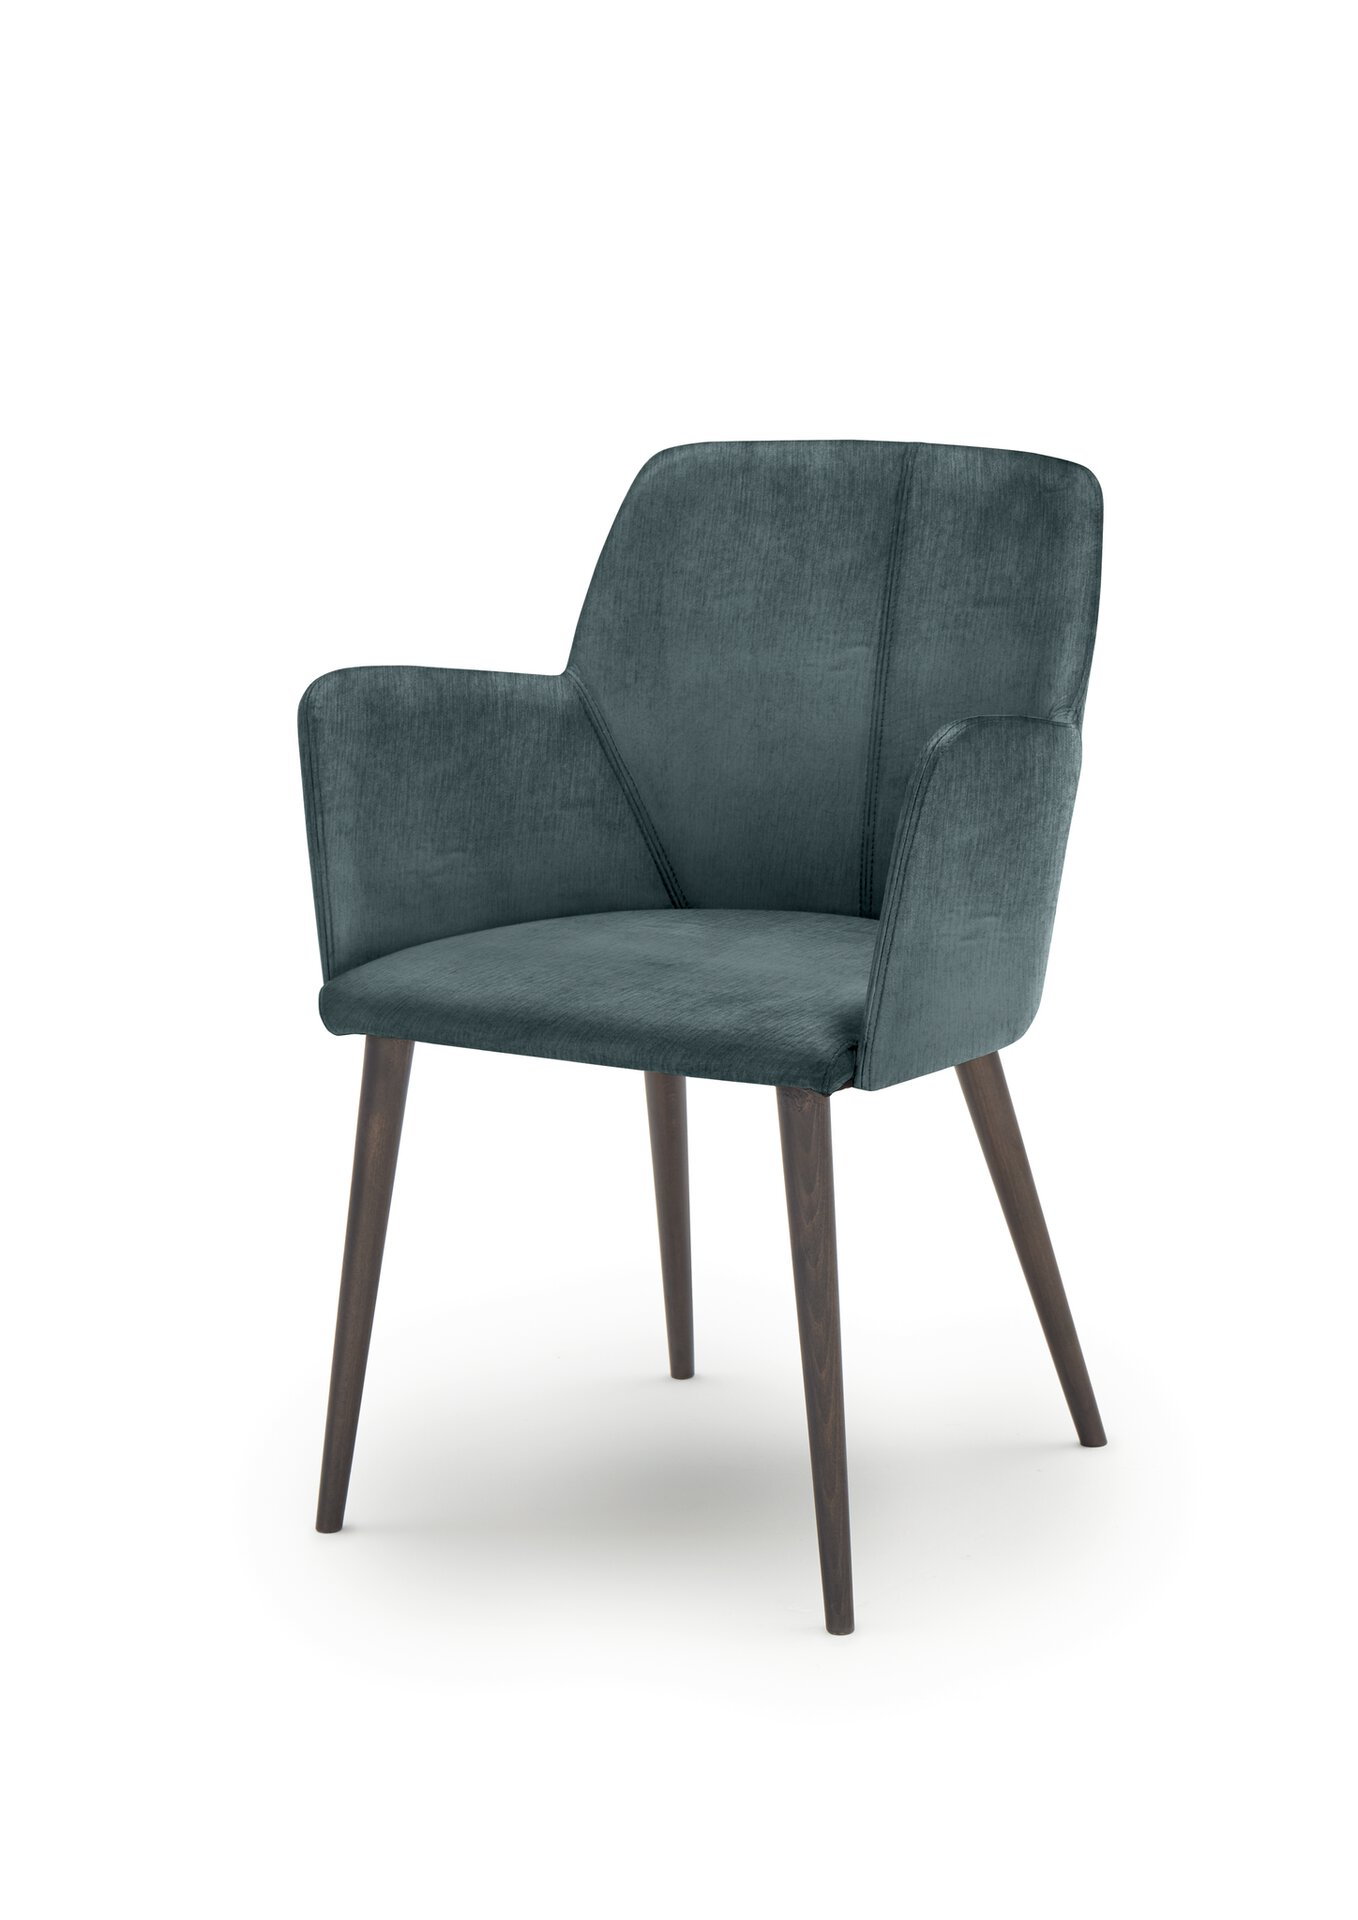 4-Fuß-Stuhl WK7005 Stuart WK Wohnen Edition Textil Blau 57 x 83 x 59 cm